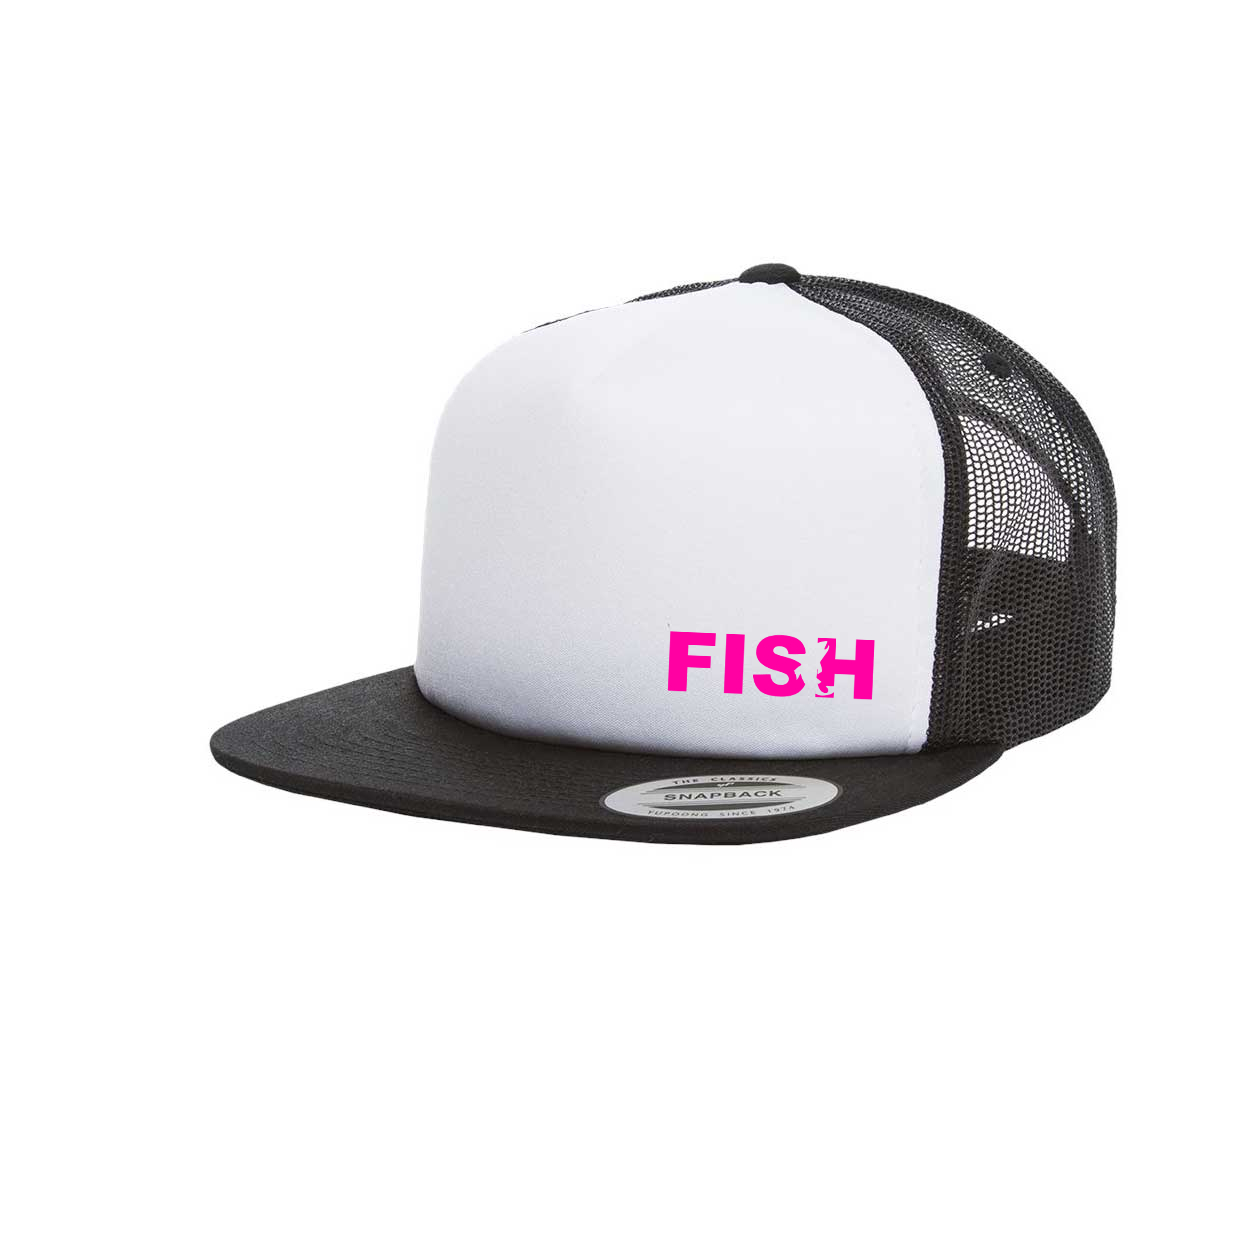 Fish Catch Logo Night Out Premium Foam Flat Brim Snapback Hat Black/White (Pink Logo)